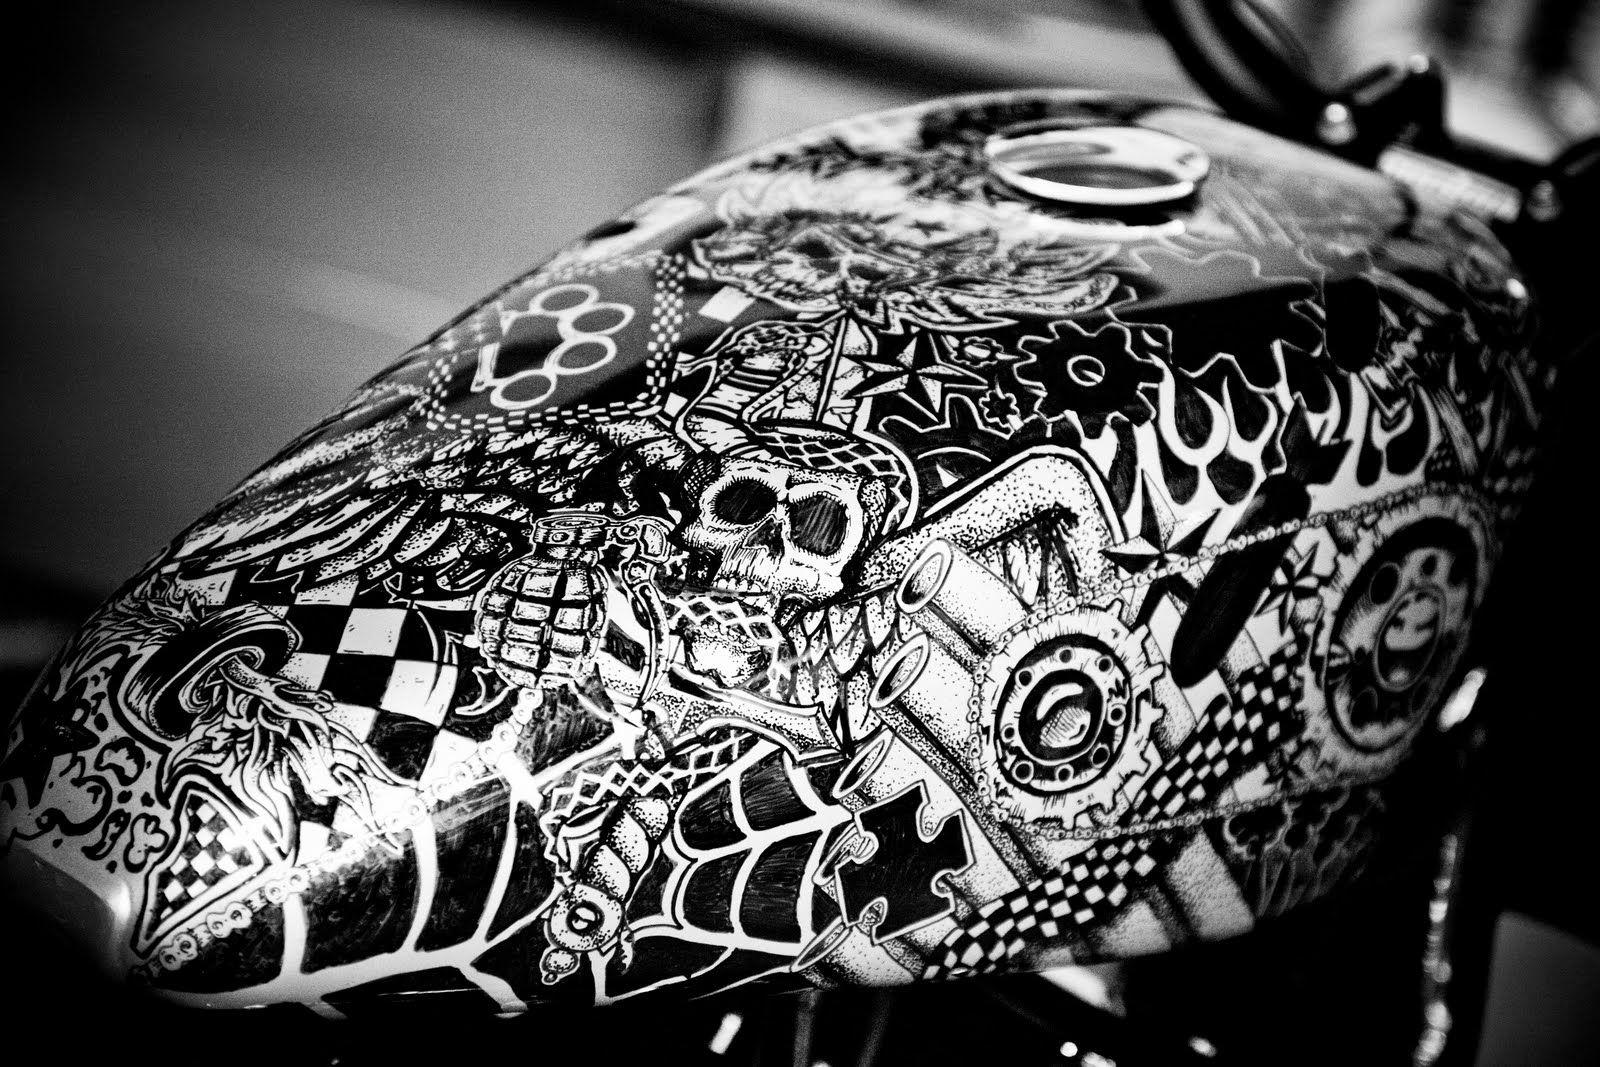 Custom Paint Black White Motorcycle Tank - Google